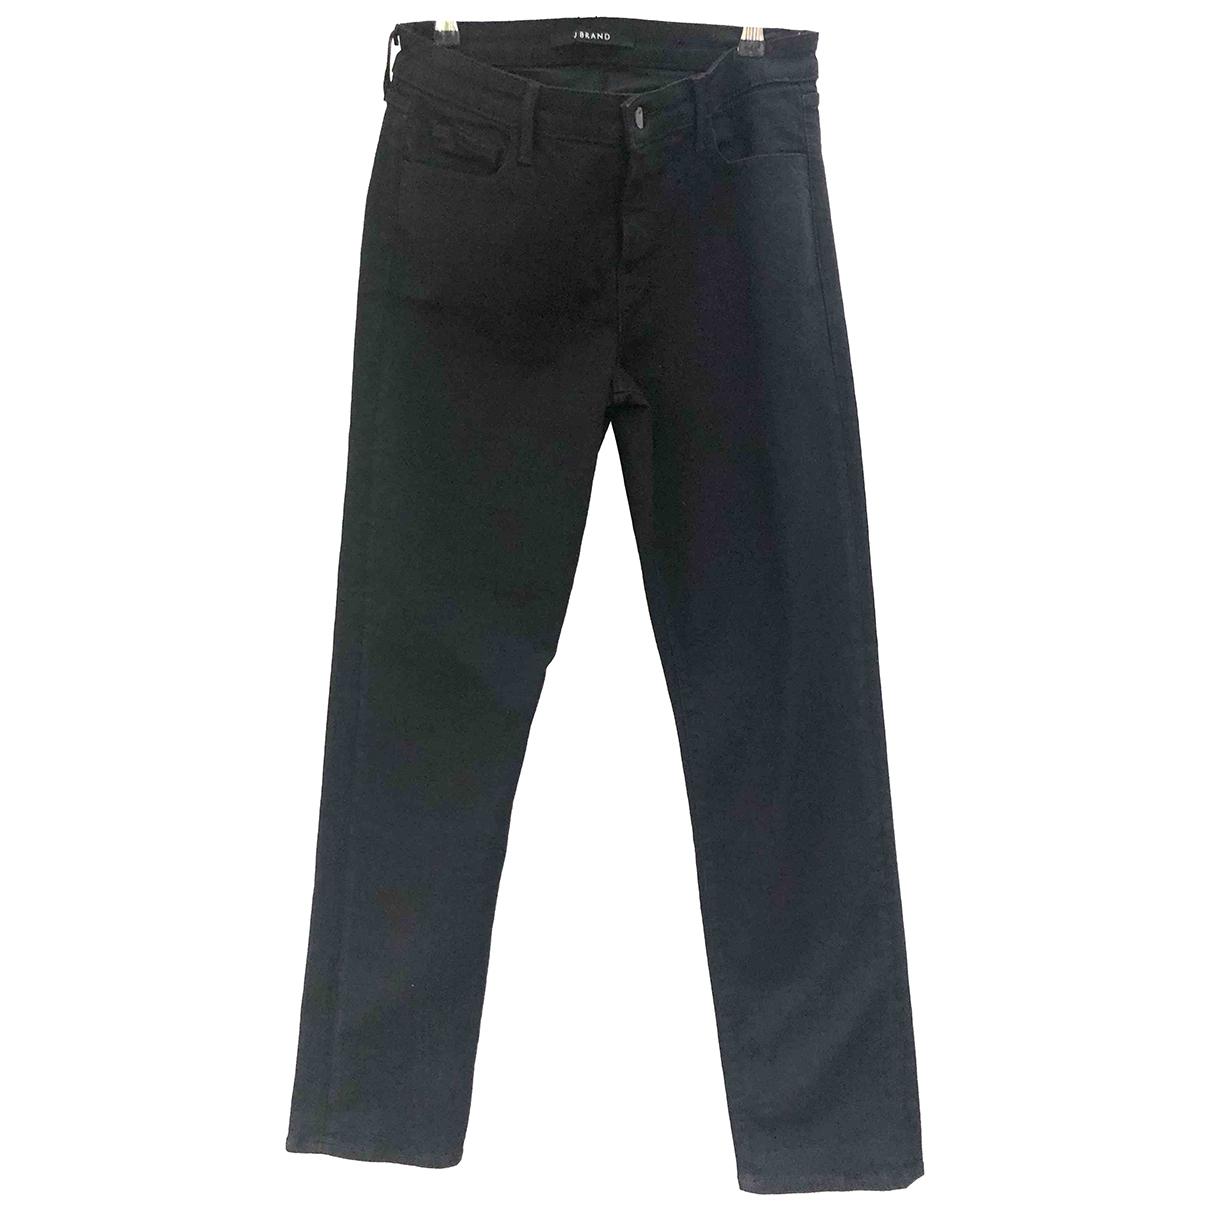 J Brand \N Black Cotton - elasthane Jeans for Women 30 US